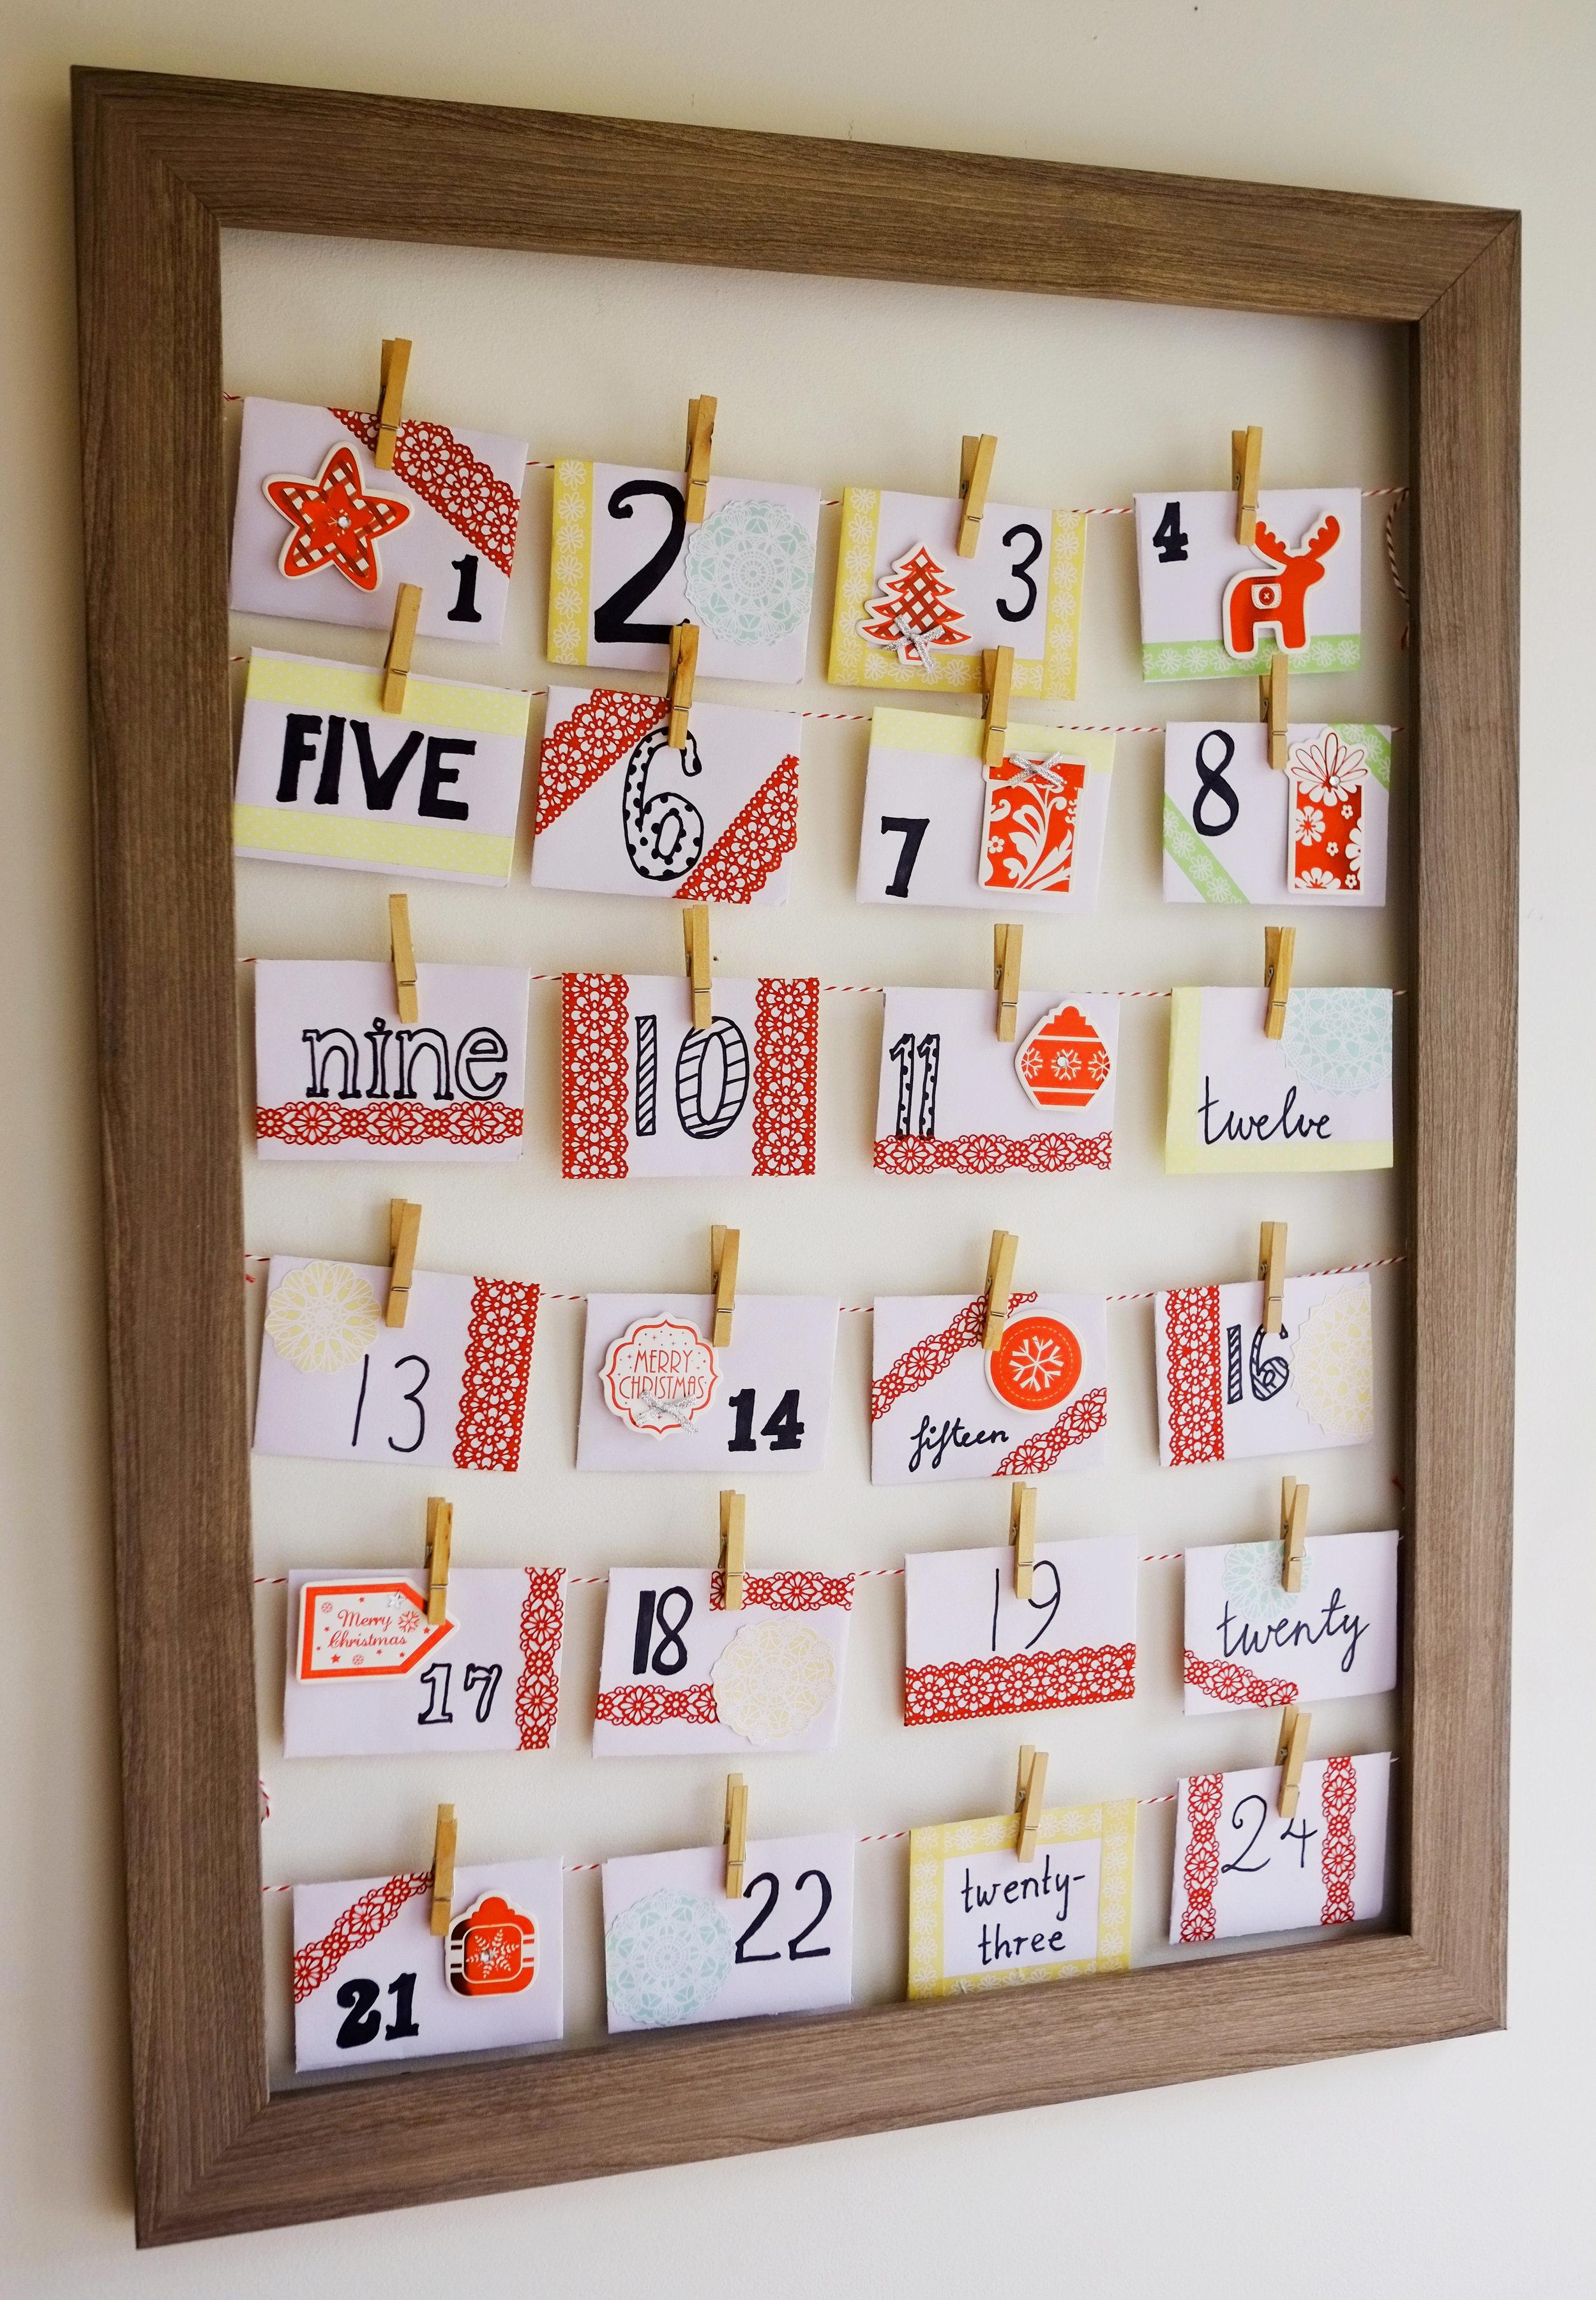 Christmas advent calendar - The Organised You